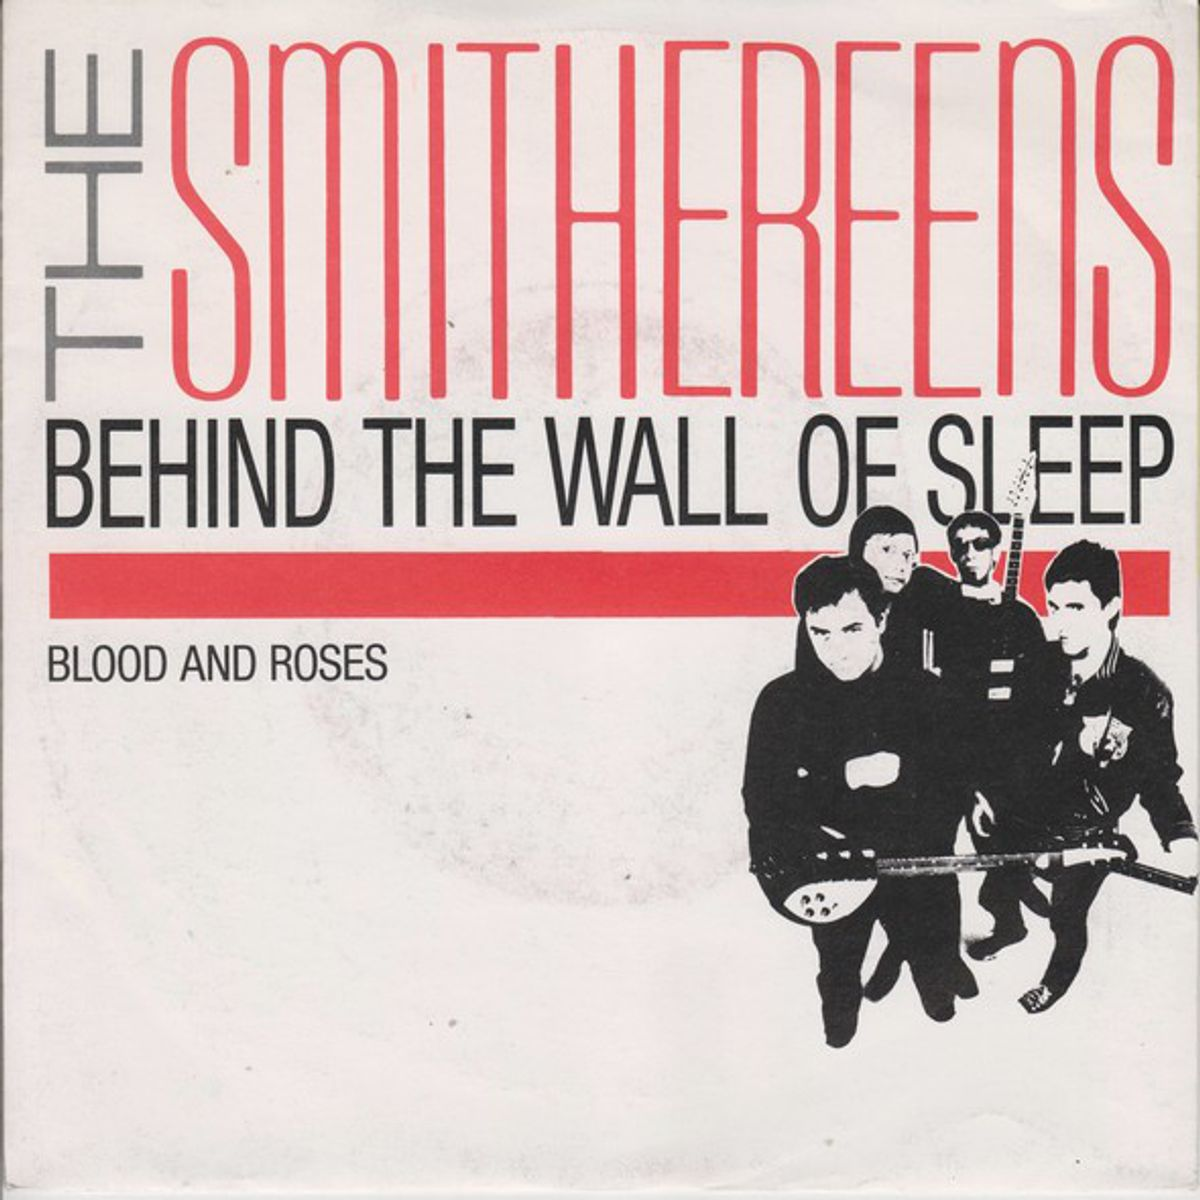 #RickenbackerRules - The Smithereens - Behind The Wall Of Sleep (1986)